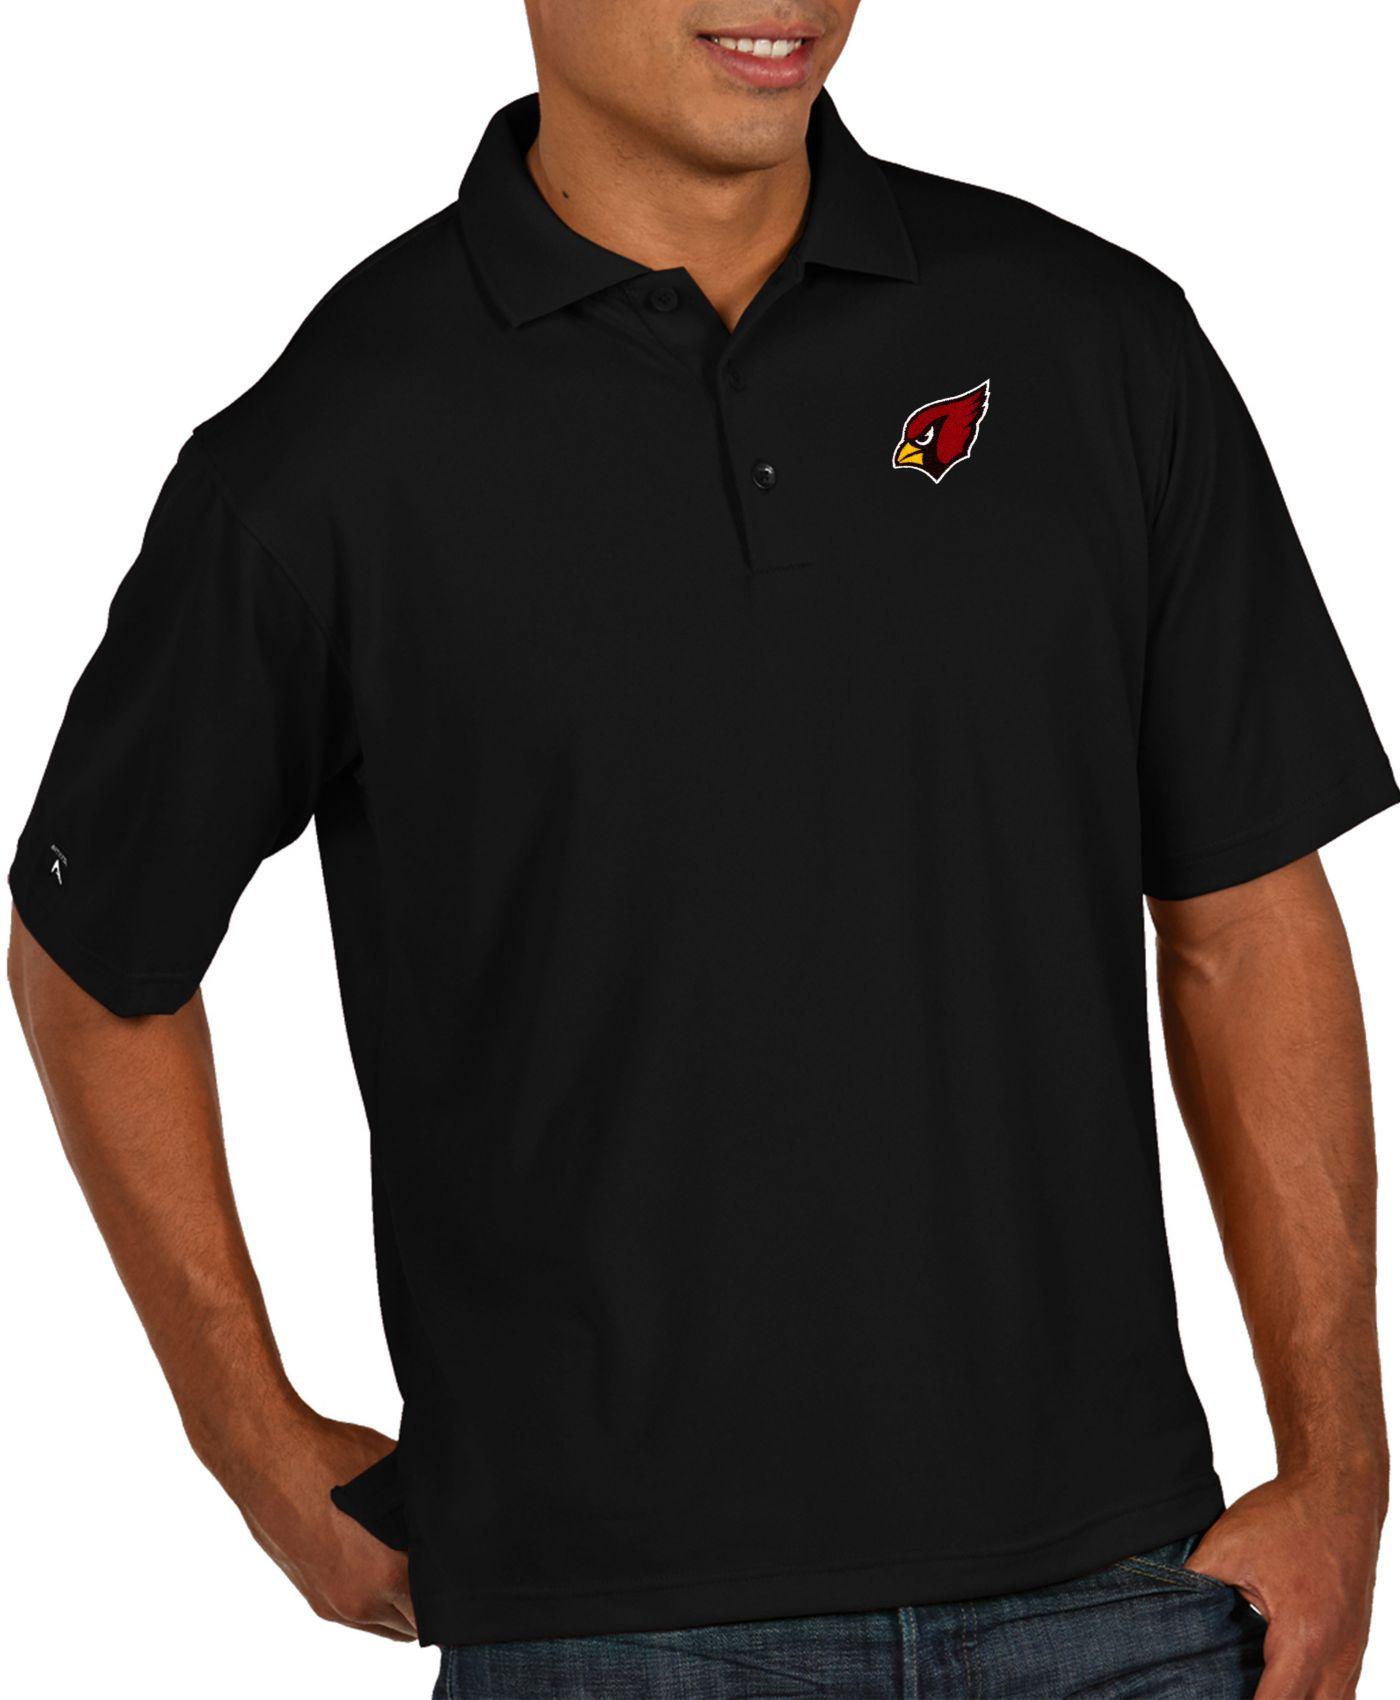 Antigua Men's Arizona Cardinals Pique Xtra-Lite Performance Black Polo